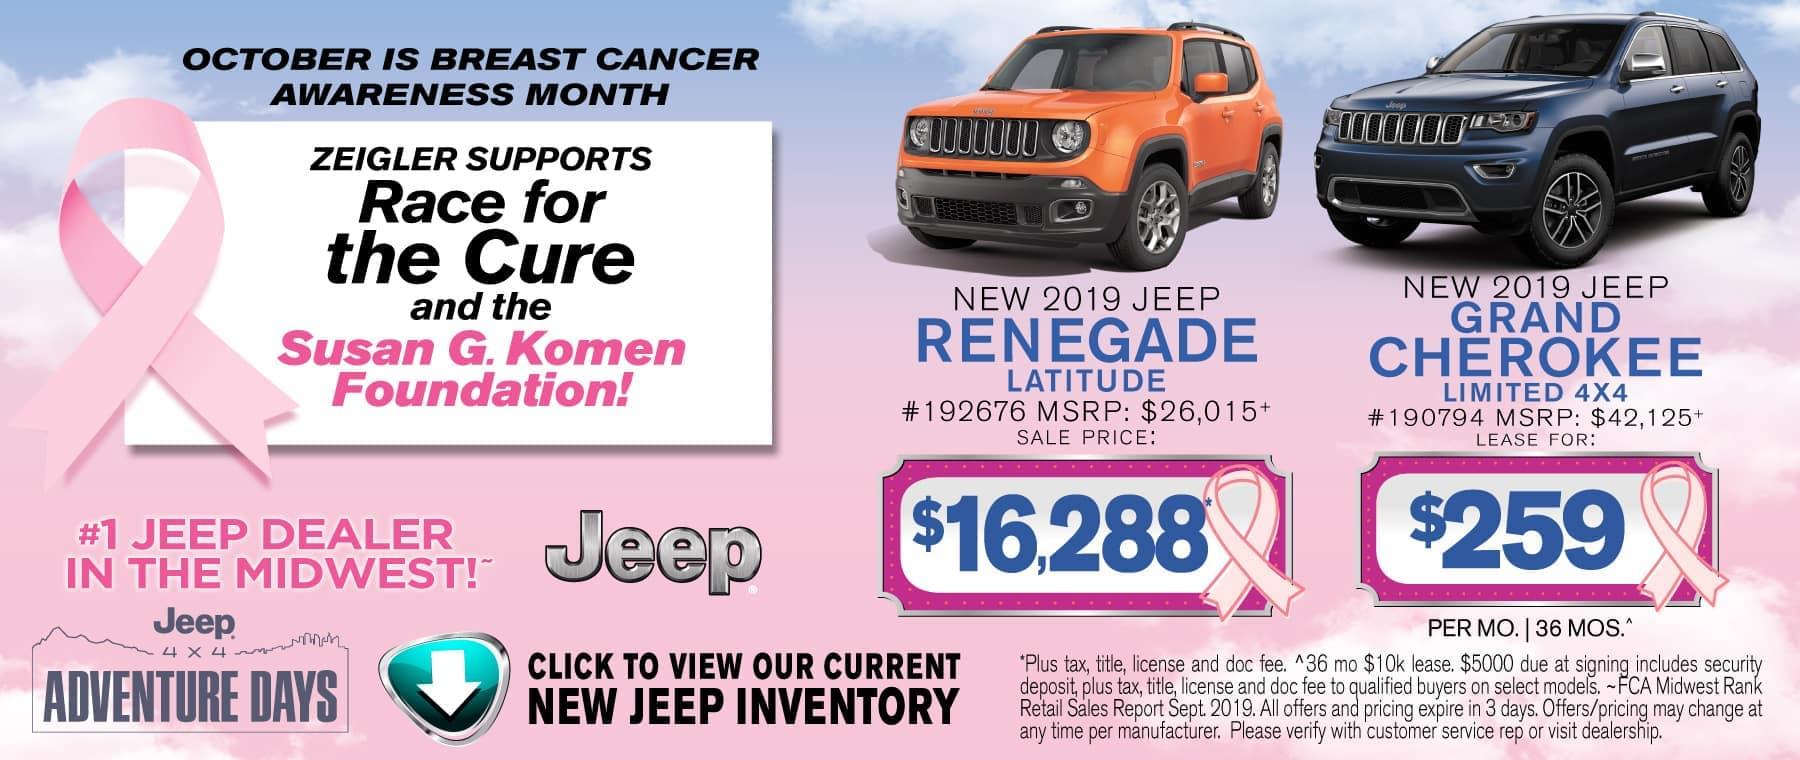 Breast Cancer Renegade Grand Cherokee